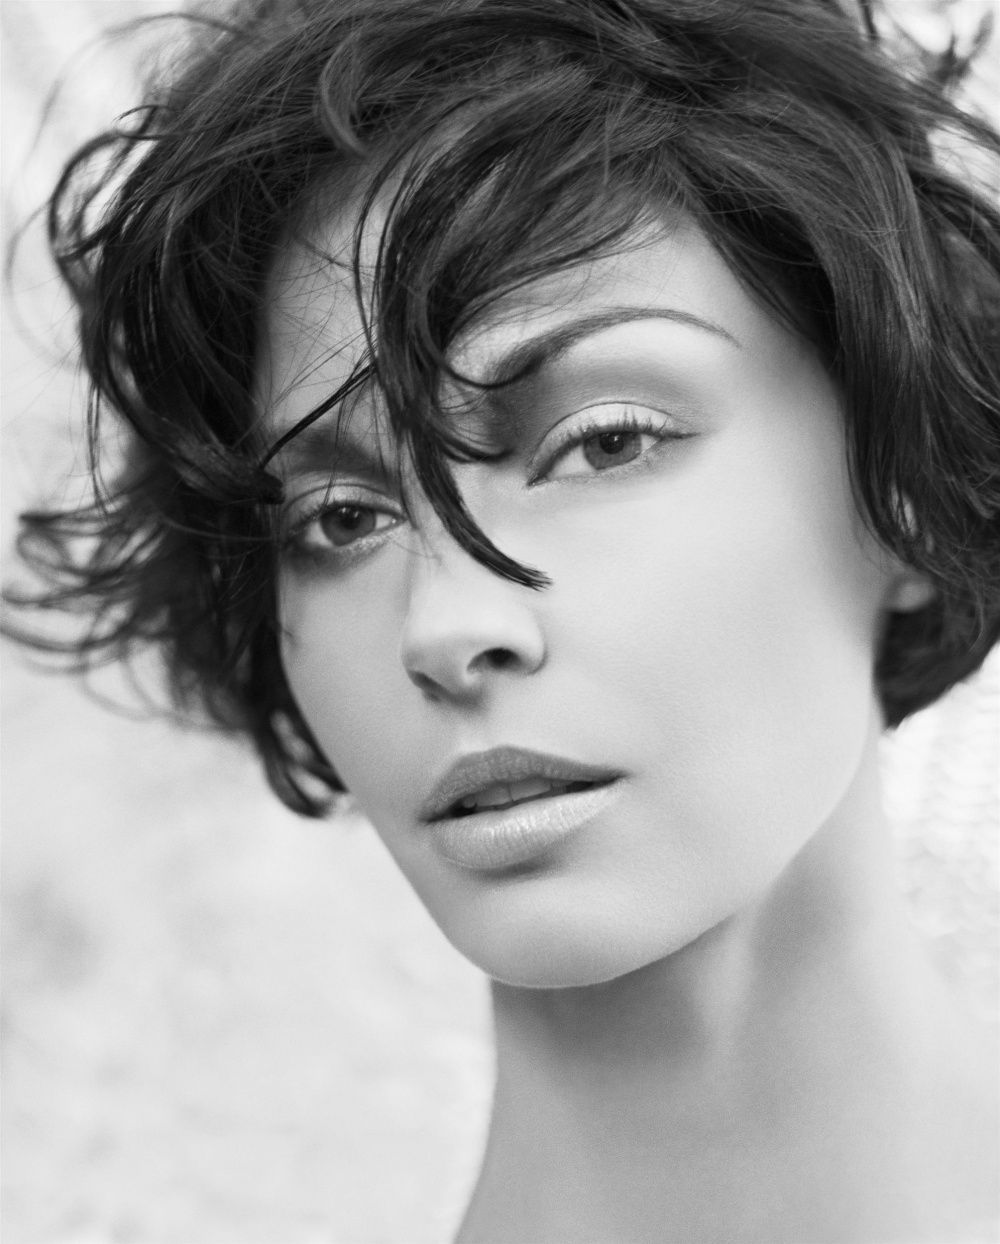 Gorgeous Black & White portrait.